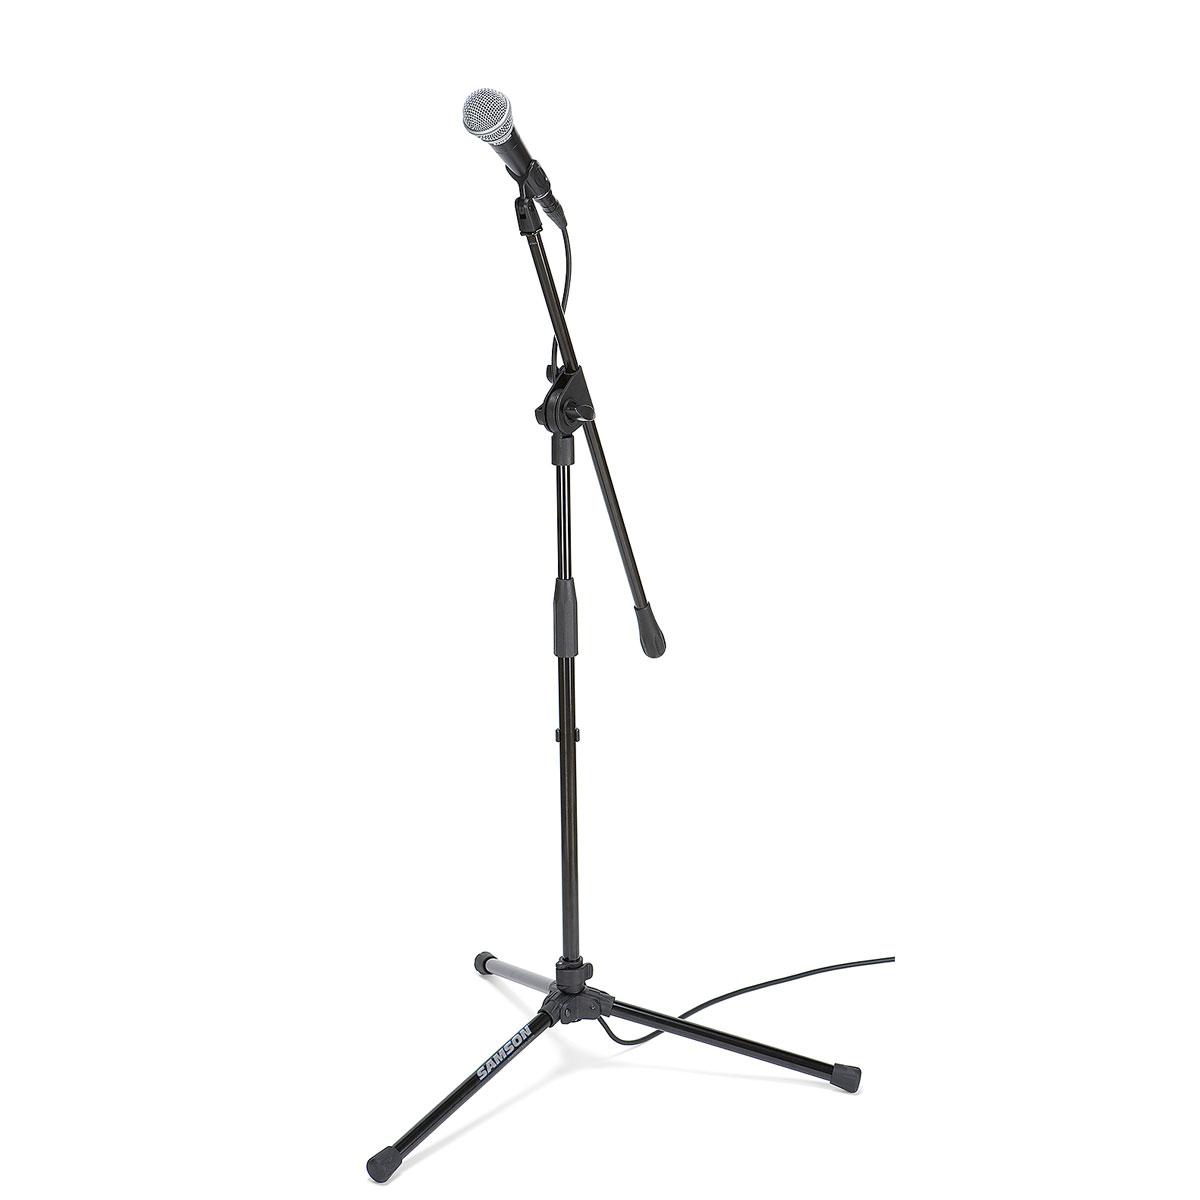 1200x1200 Vp10x Microphone Value Pack Xlr